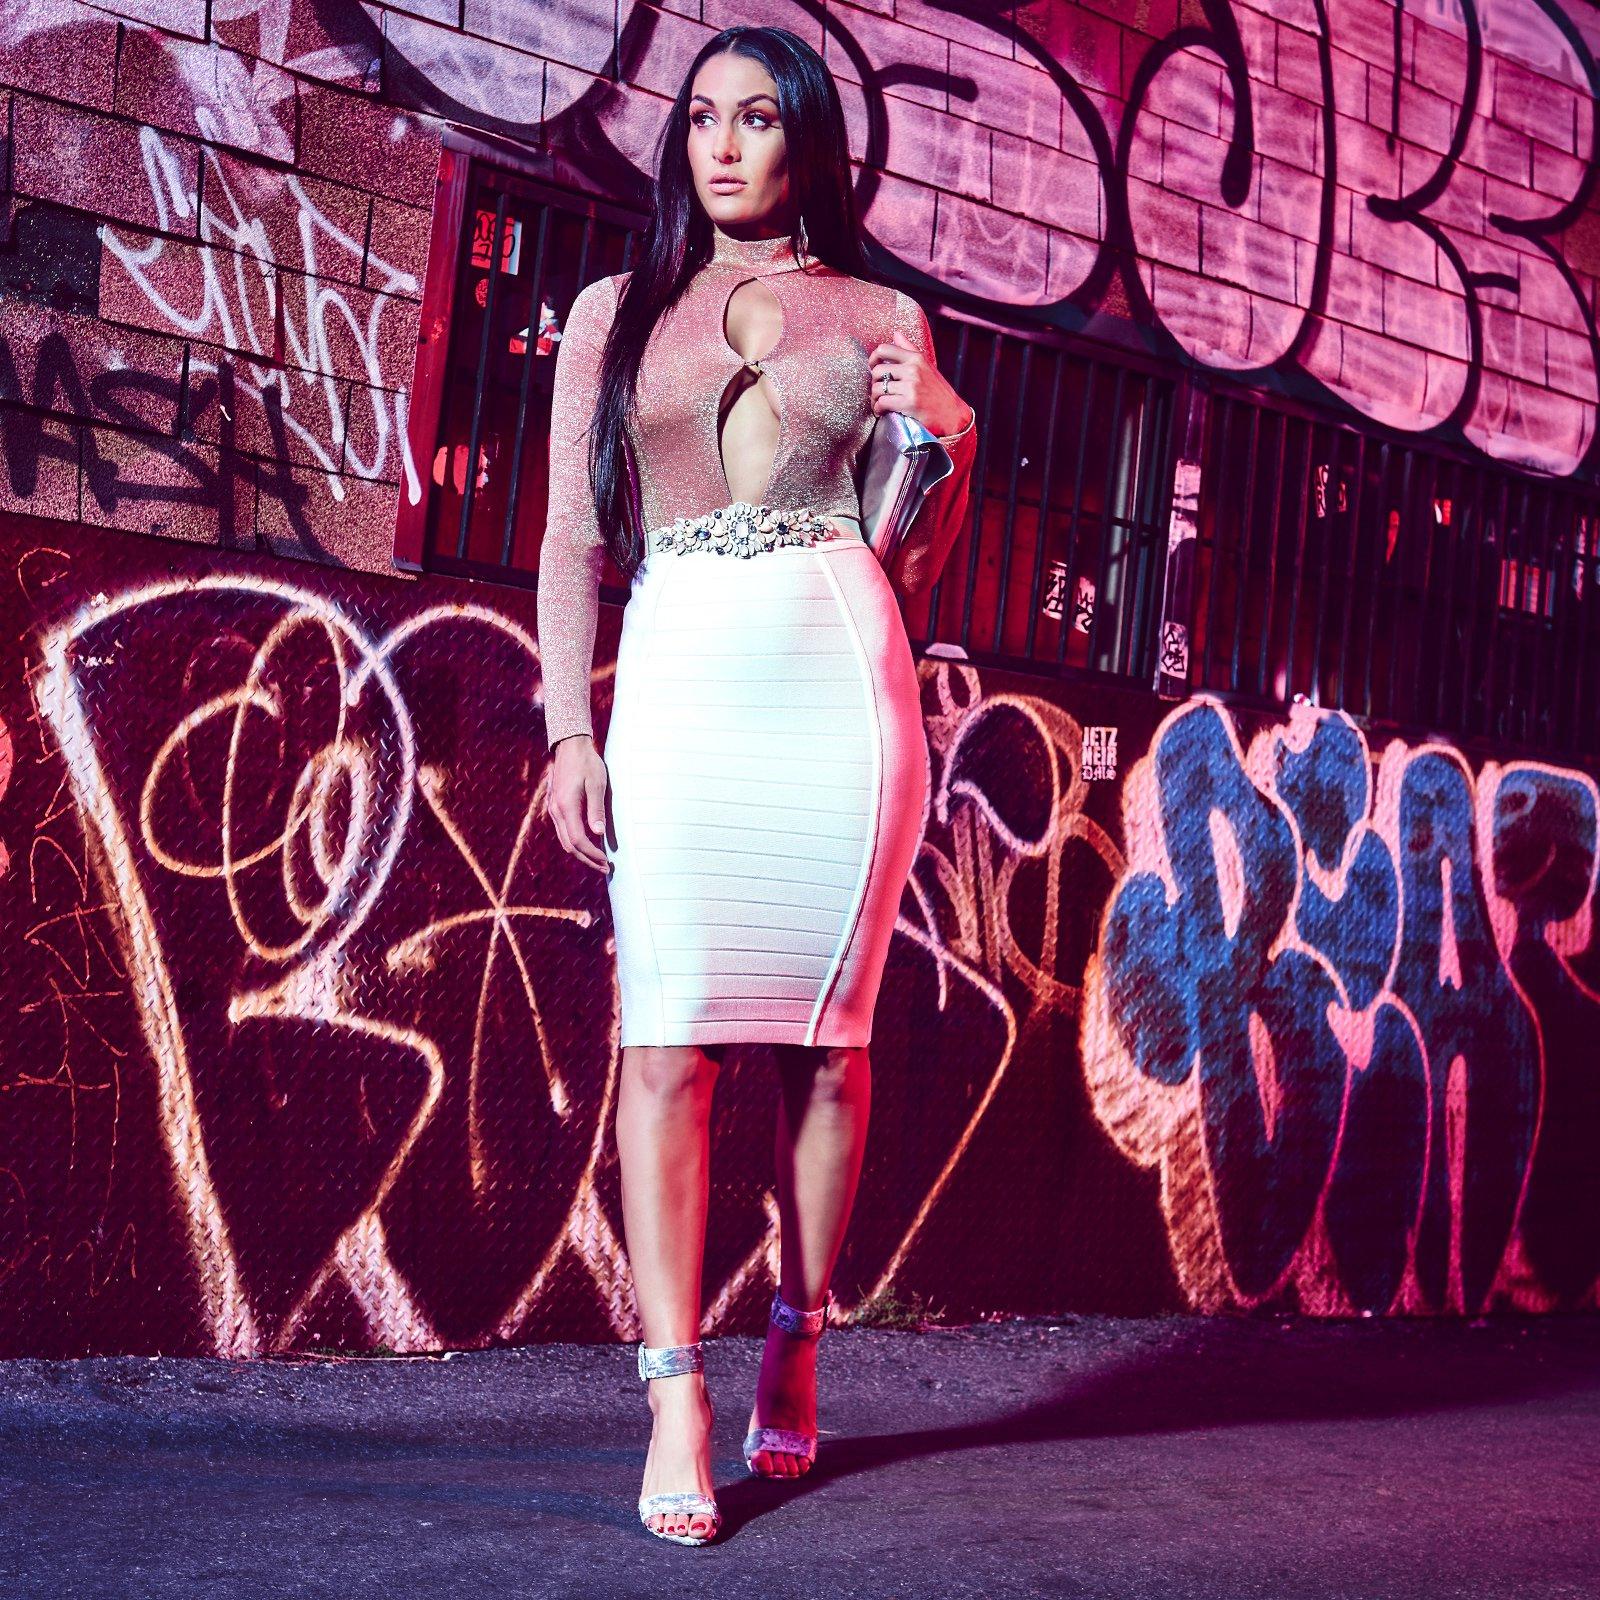 Nikki Bella Alexa Bliss And Naomi In New York City Nights